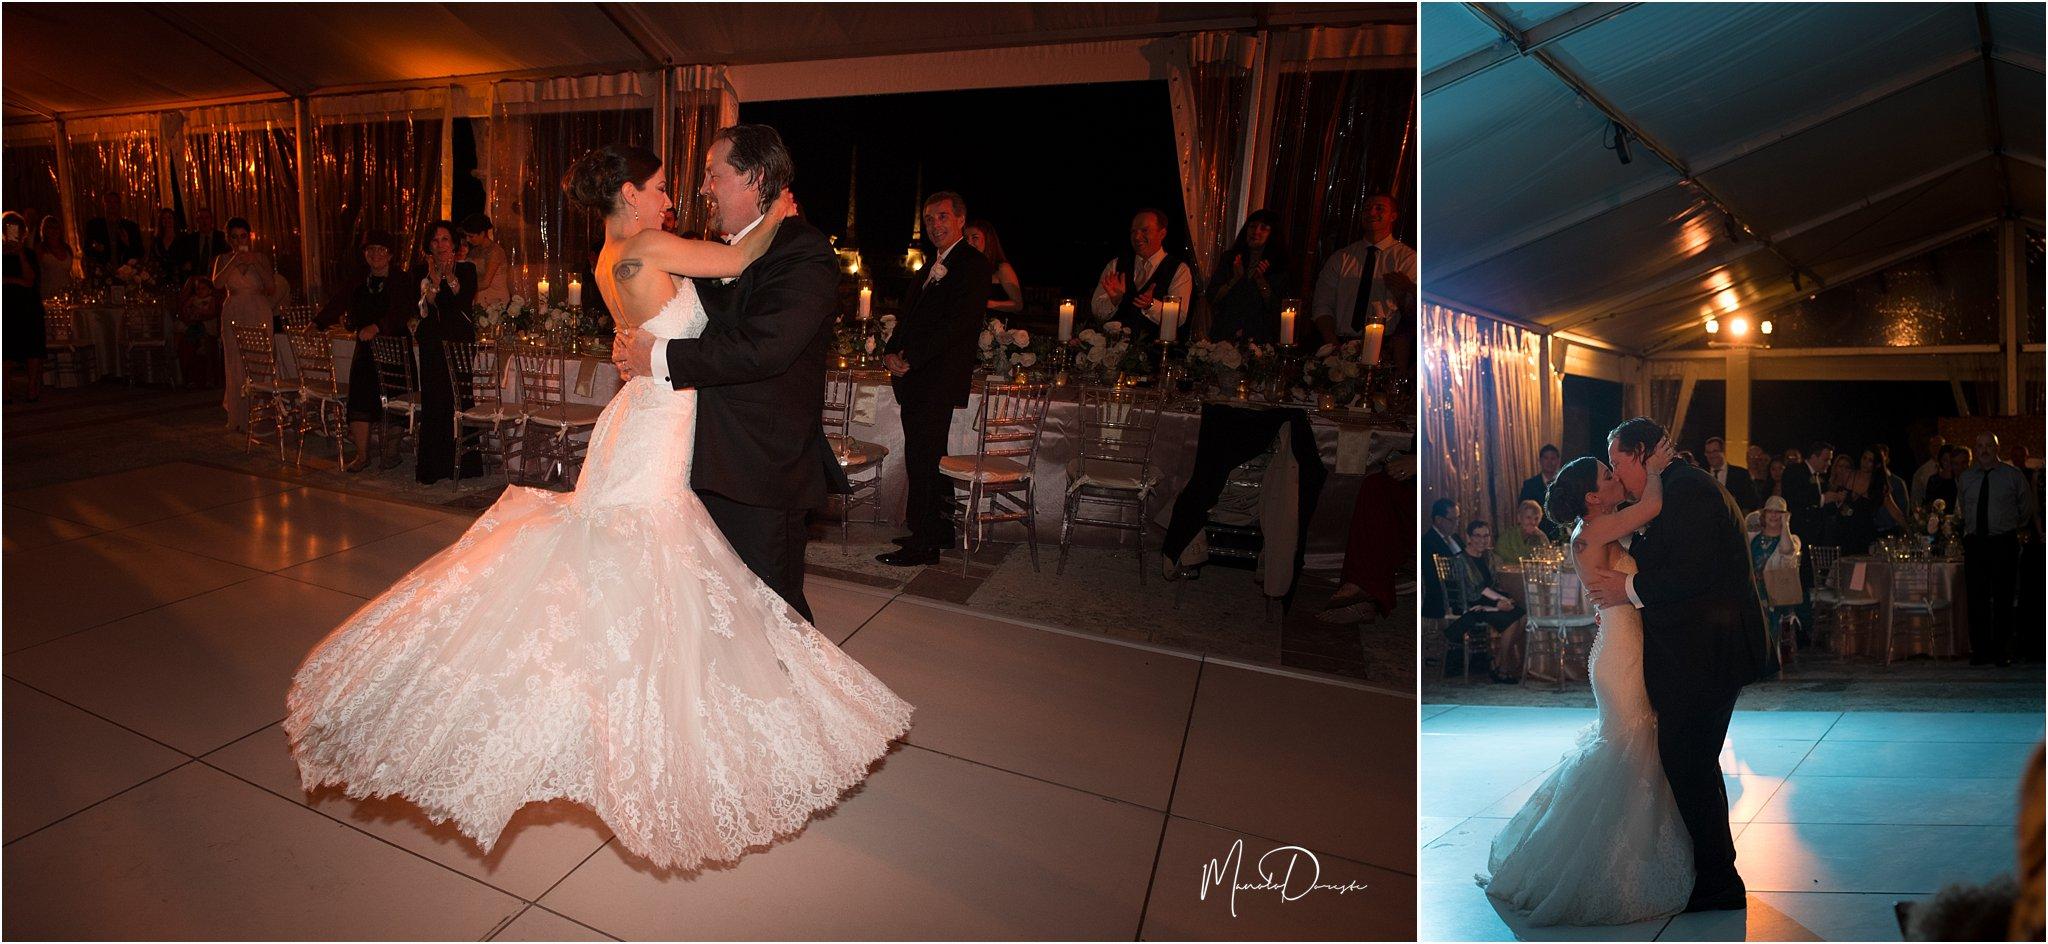 00761_ManoloDoreste_InFocusStudios_Wedding_Family_Photography_Miami_MiamiPhotographer.jpg